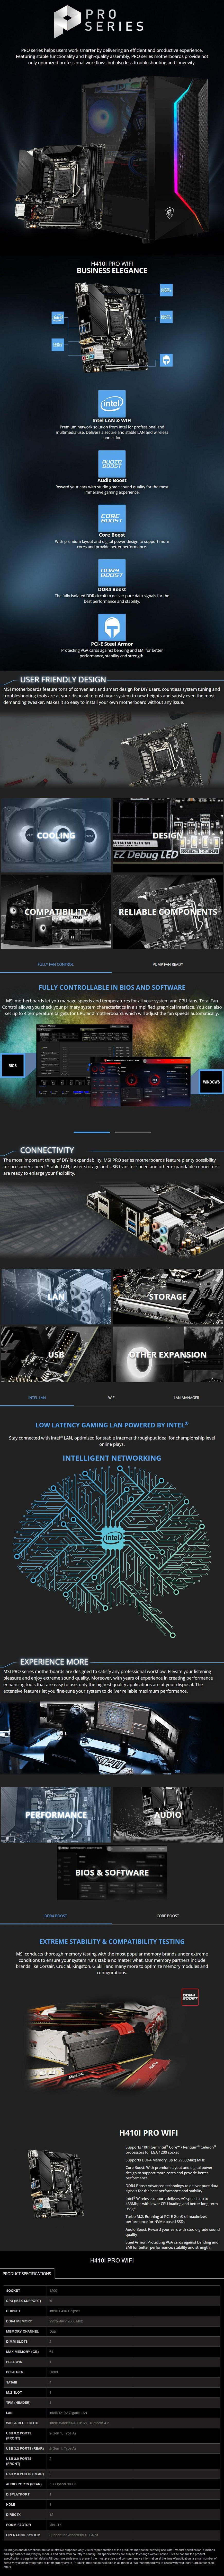 msi-h410i-pro-wifi-lga1200-miniitx-motherboard-ac41222-9.jpg